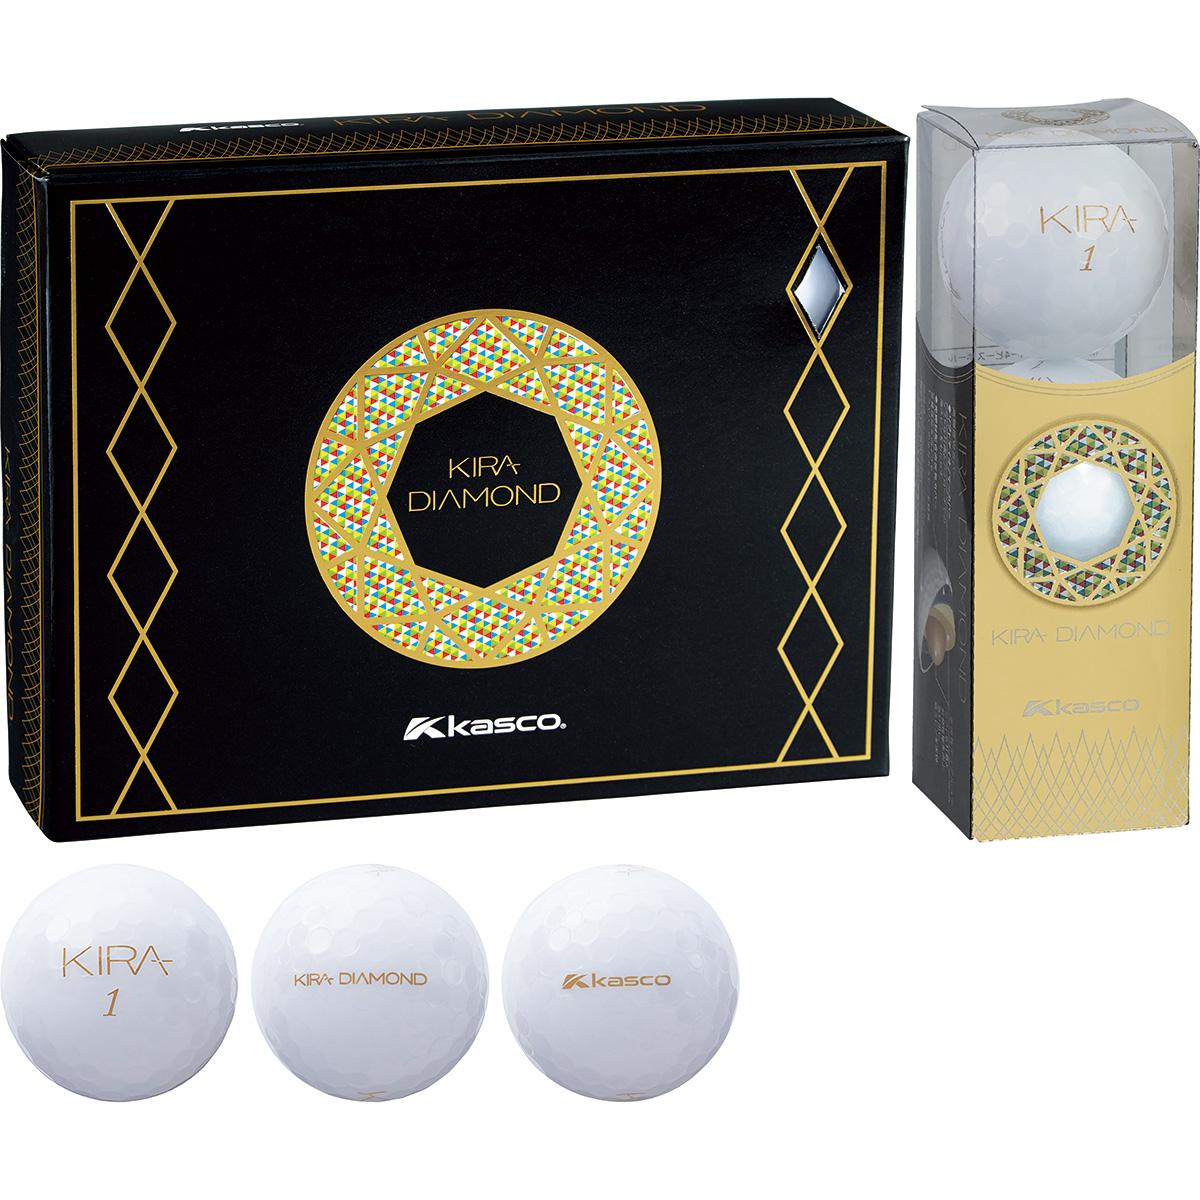 KIRA DIAMOND ボール